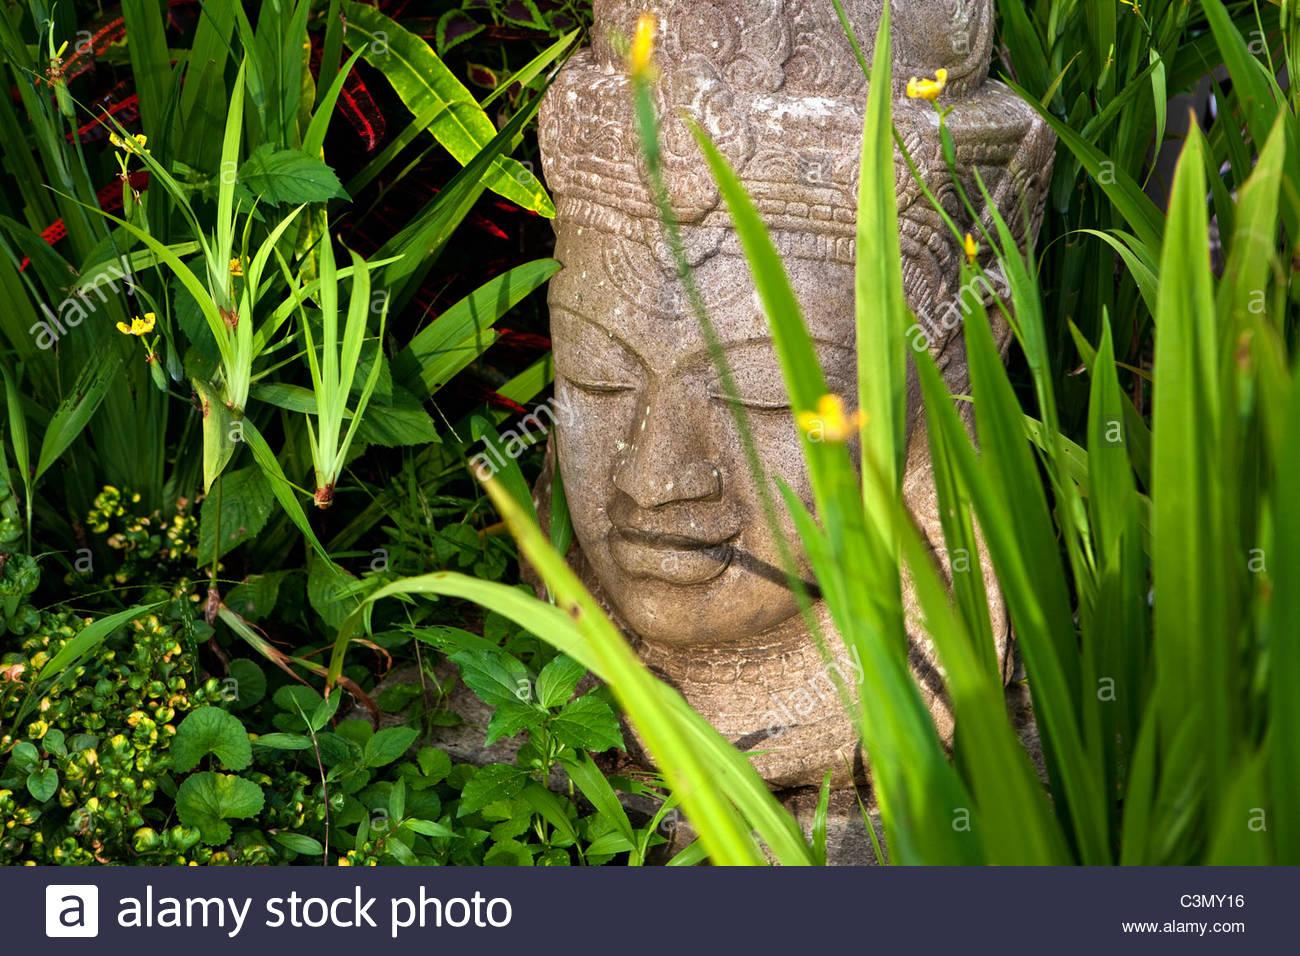 Indonesia, Island Bali, Blimbing, or Belimbing, Kedun Resort. Buddha statue. - Stock Image